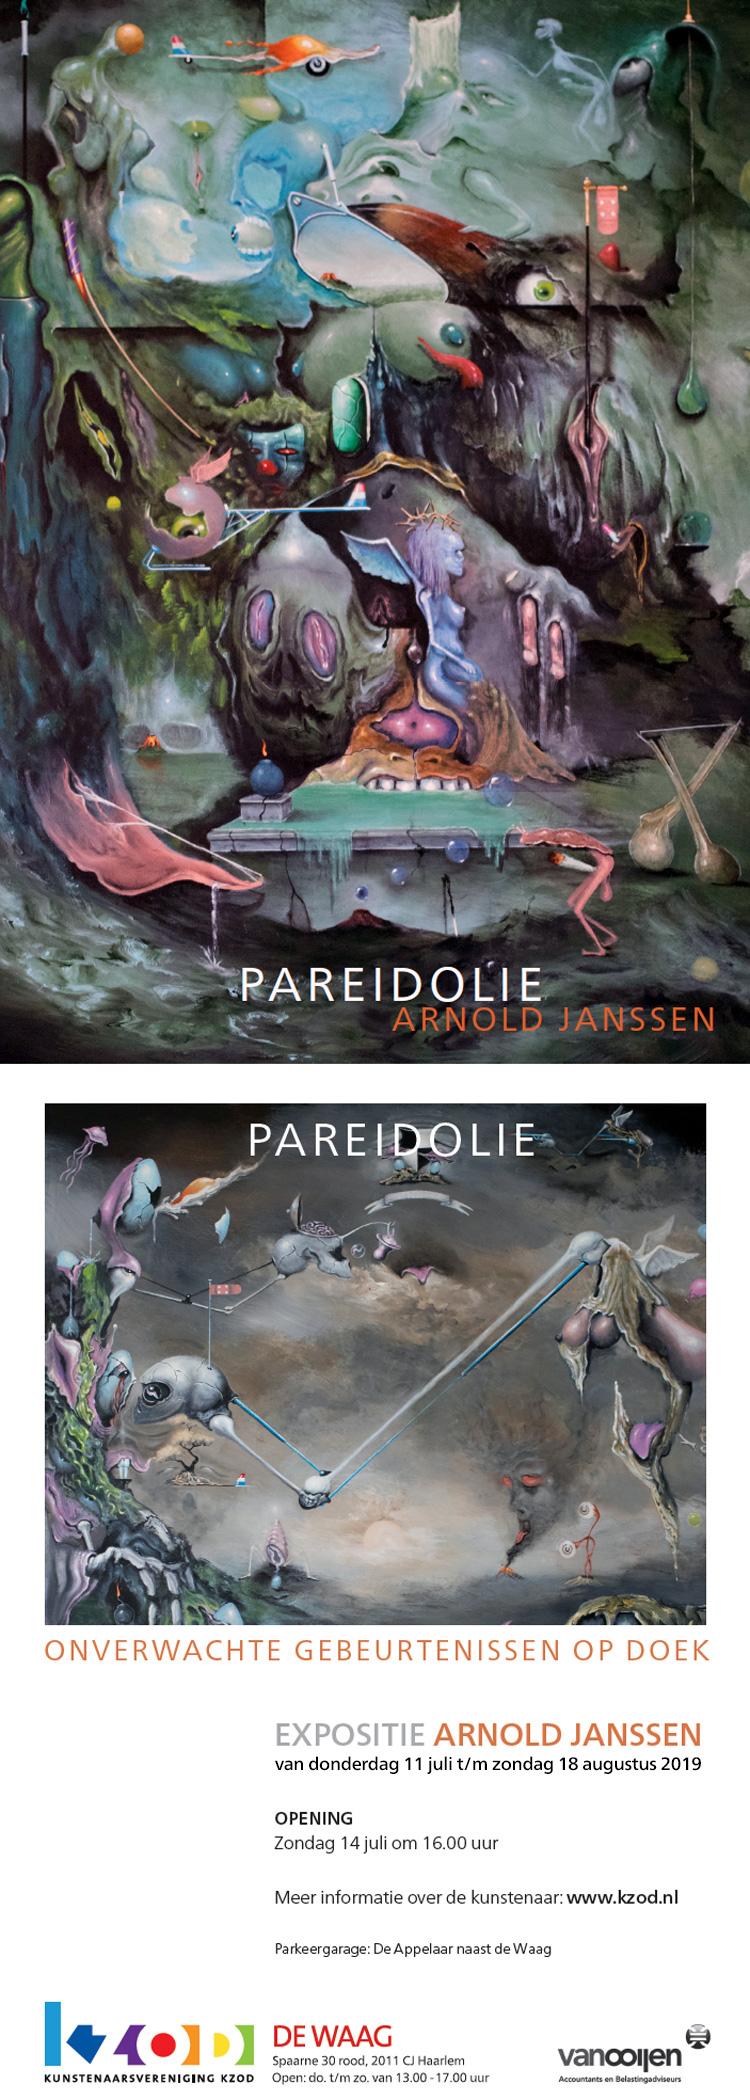 Arnold Janssen | PAREIDOLIE